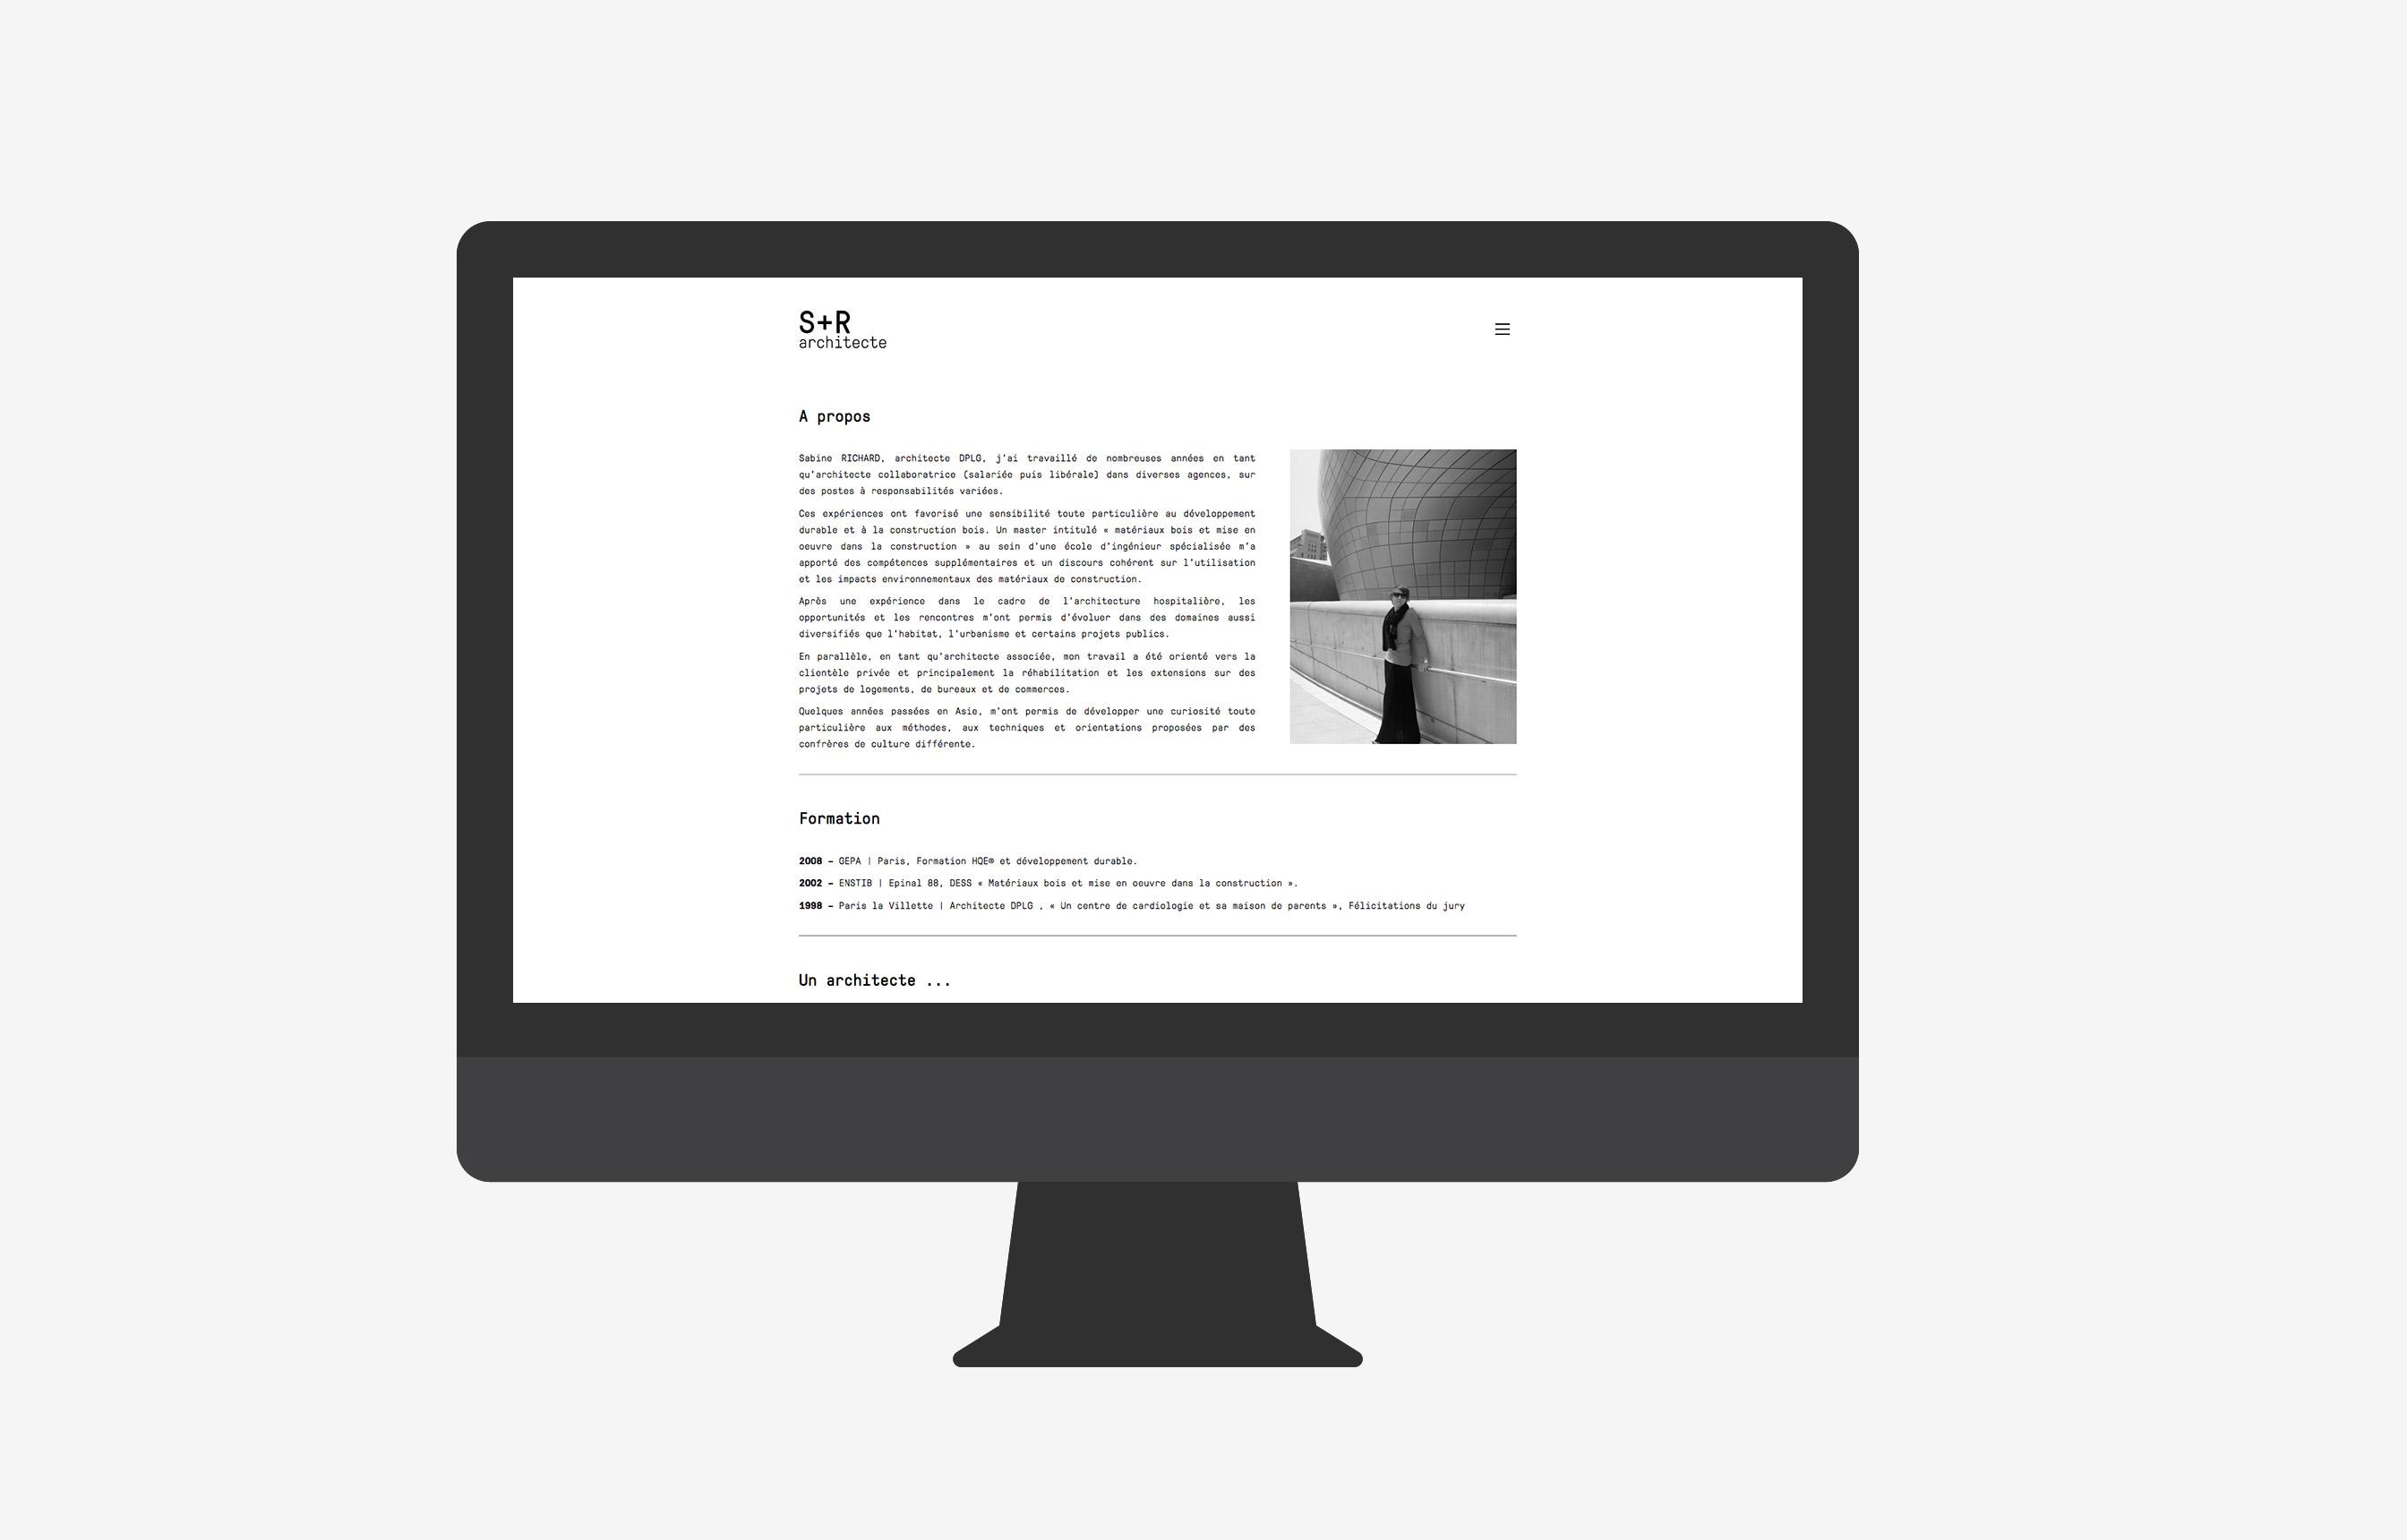 06-sr-architecte-pikteo-webdesign-graphic-design-freelance-paris-bruxelles-londres